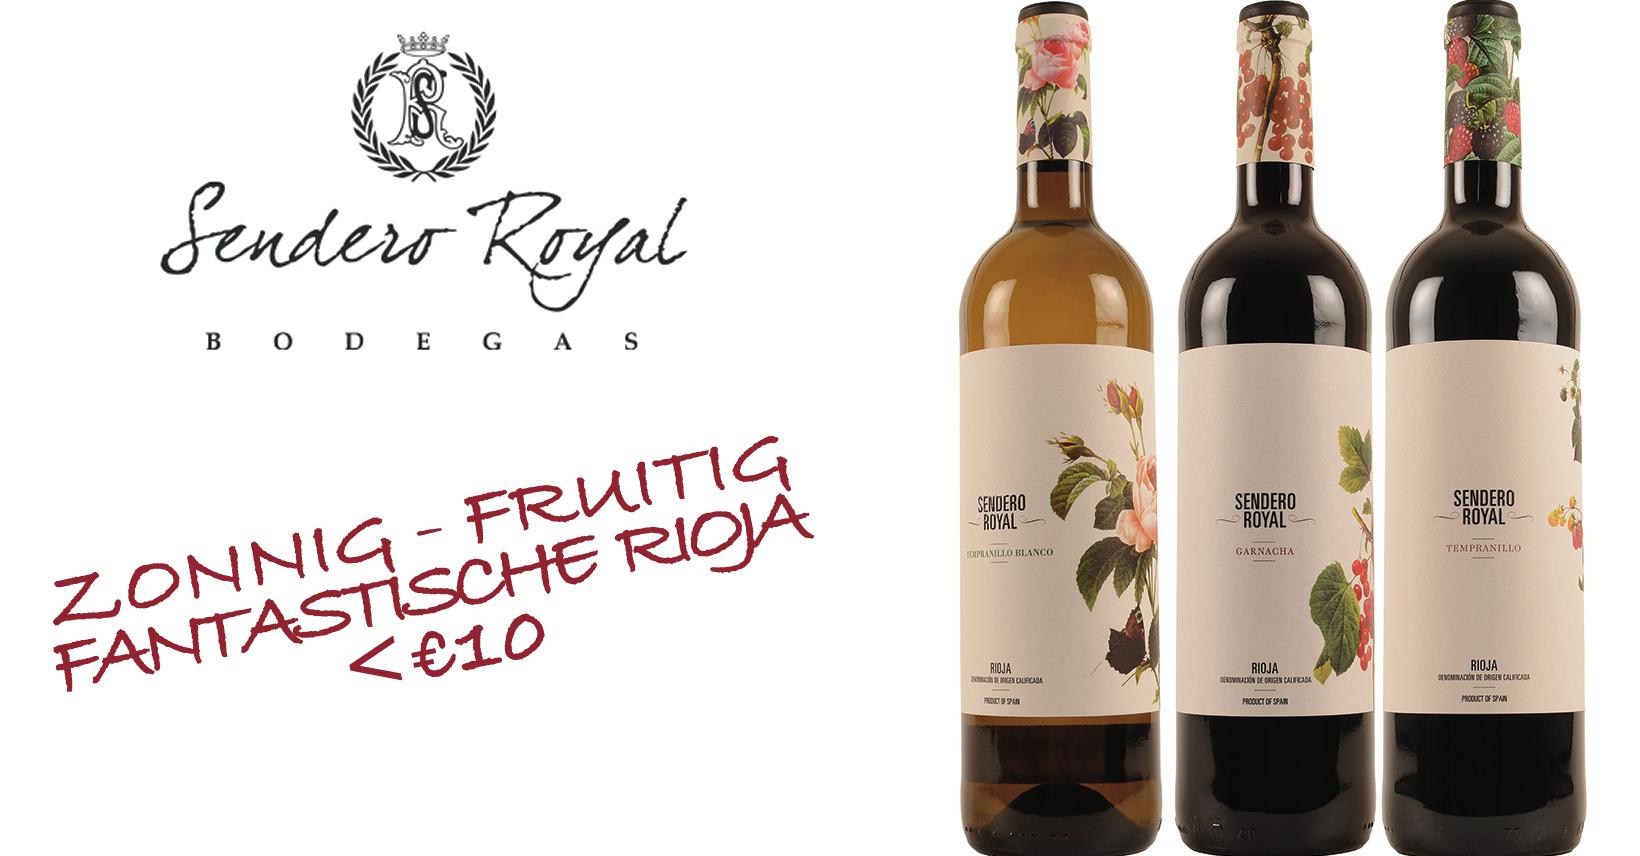 sendero royal rioja top wijn spaans Promo spanje